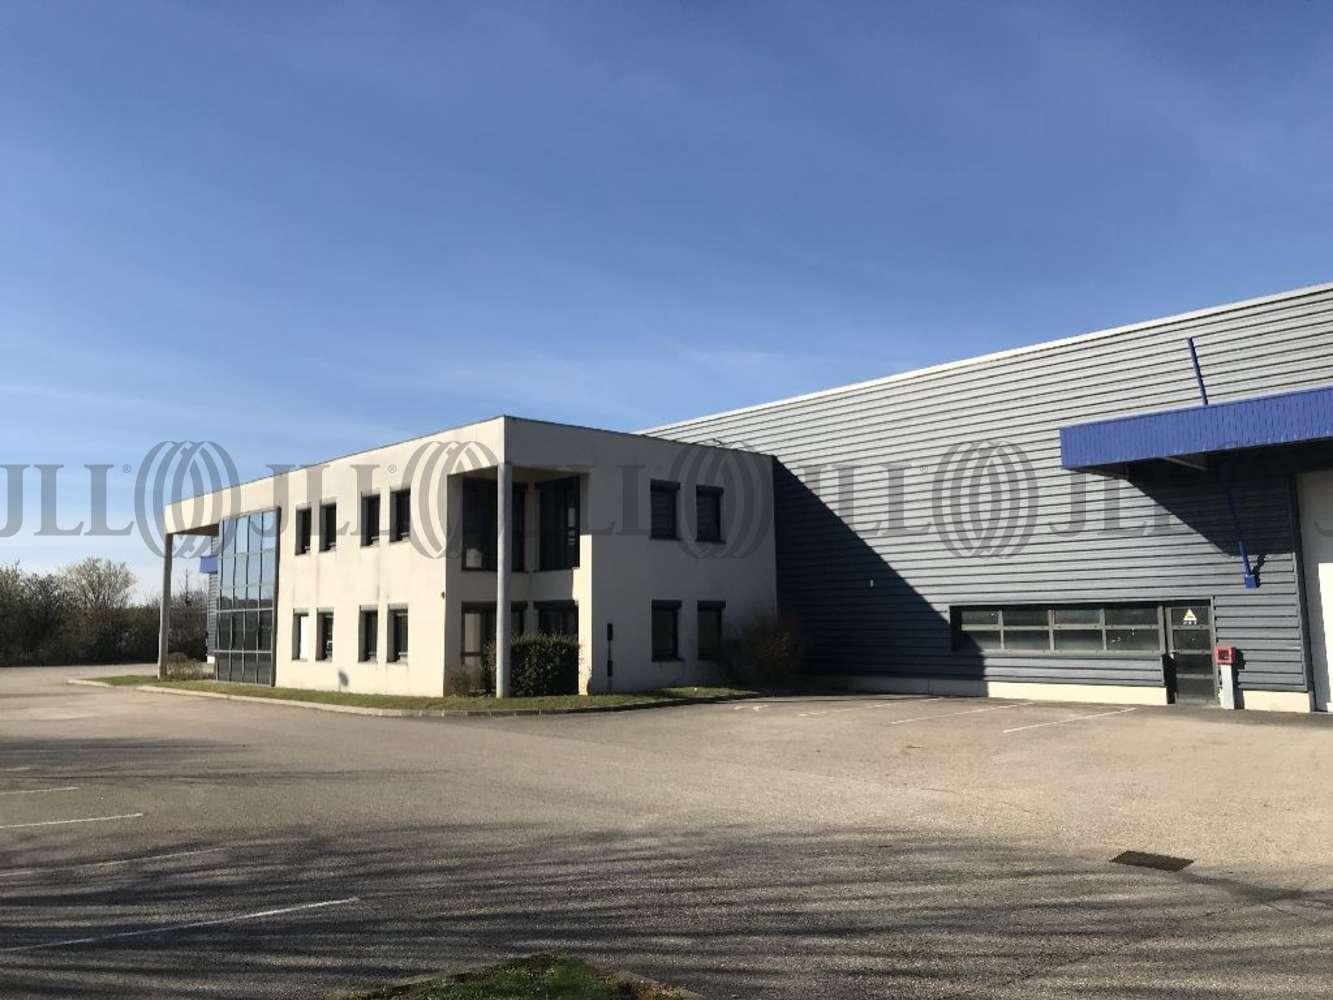 Activités/entrepôt Genas, 69740 - LOCATION ENTREPOT GENAS - 10026833